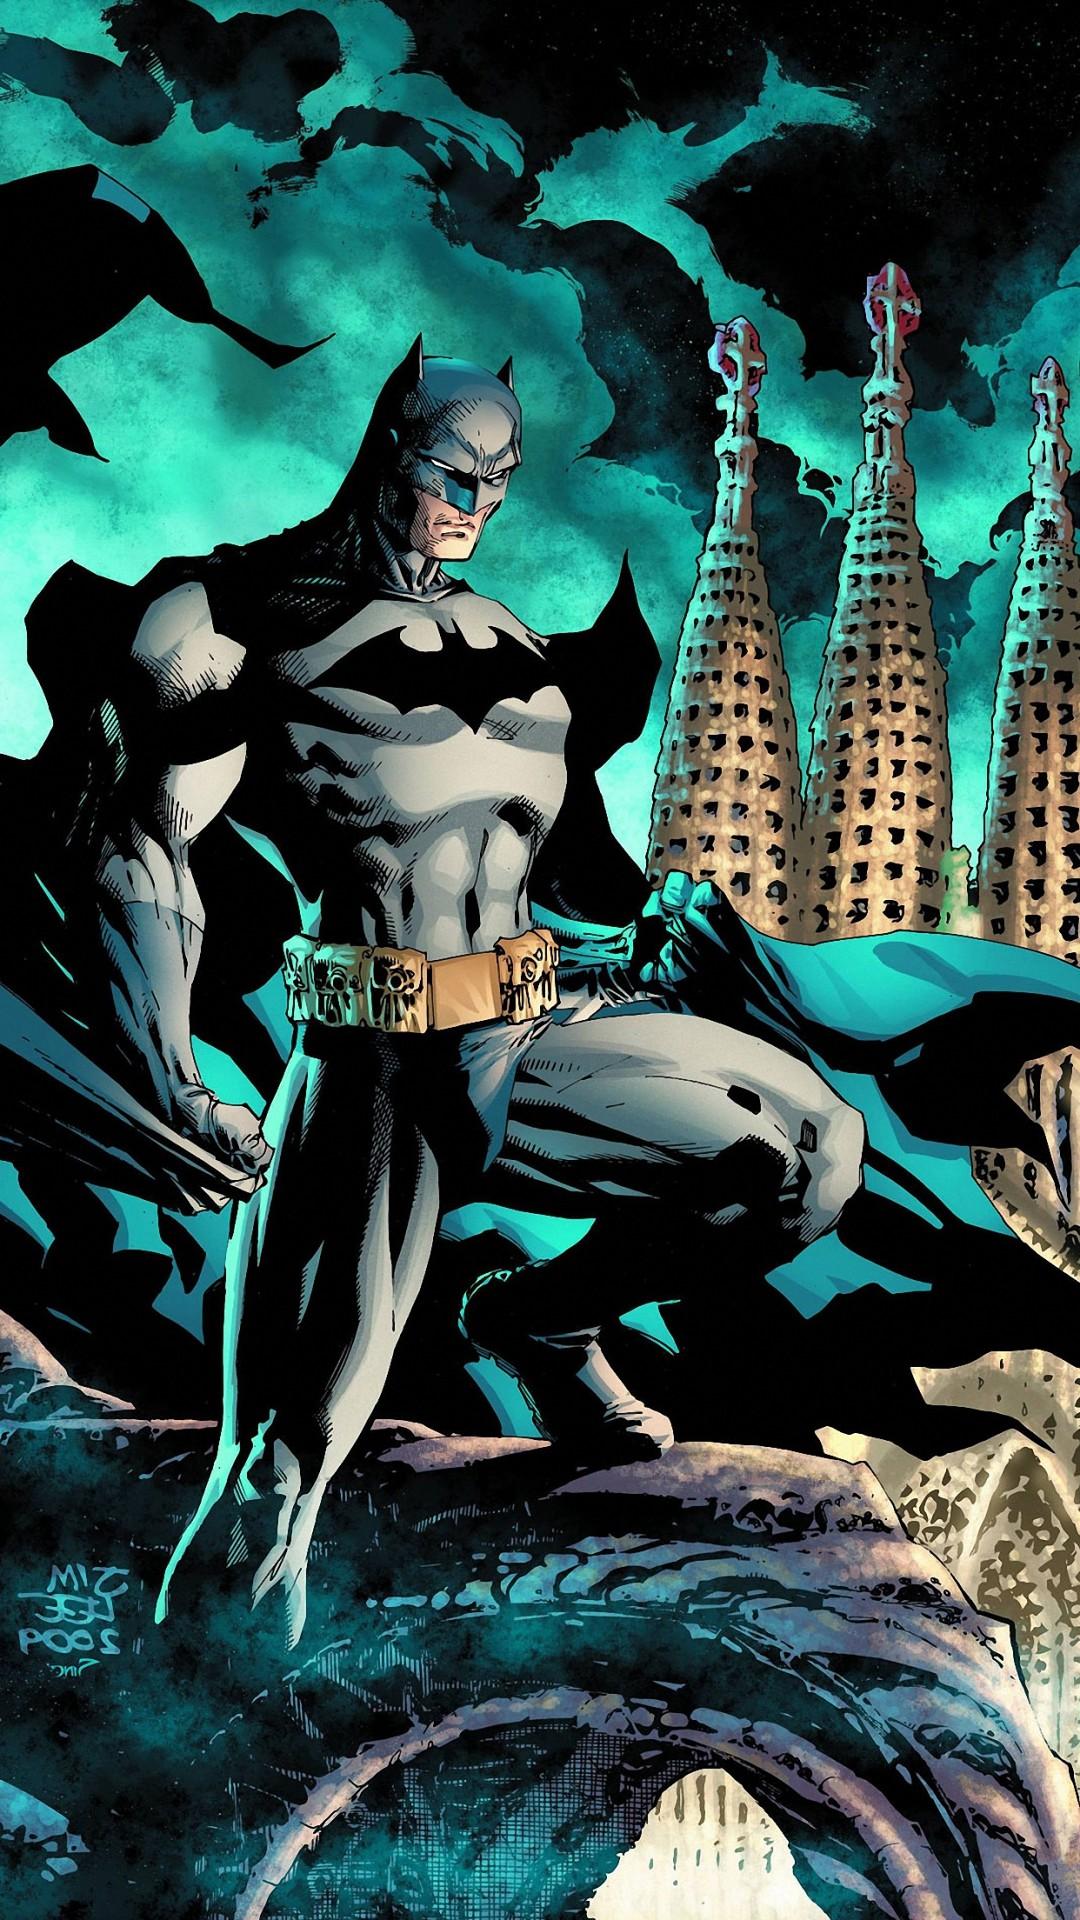 Free Download Batman iPhone Backgrounds.